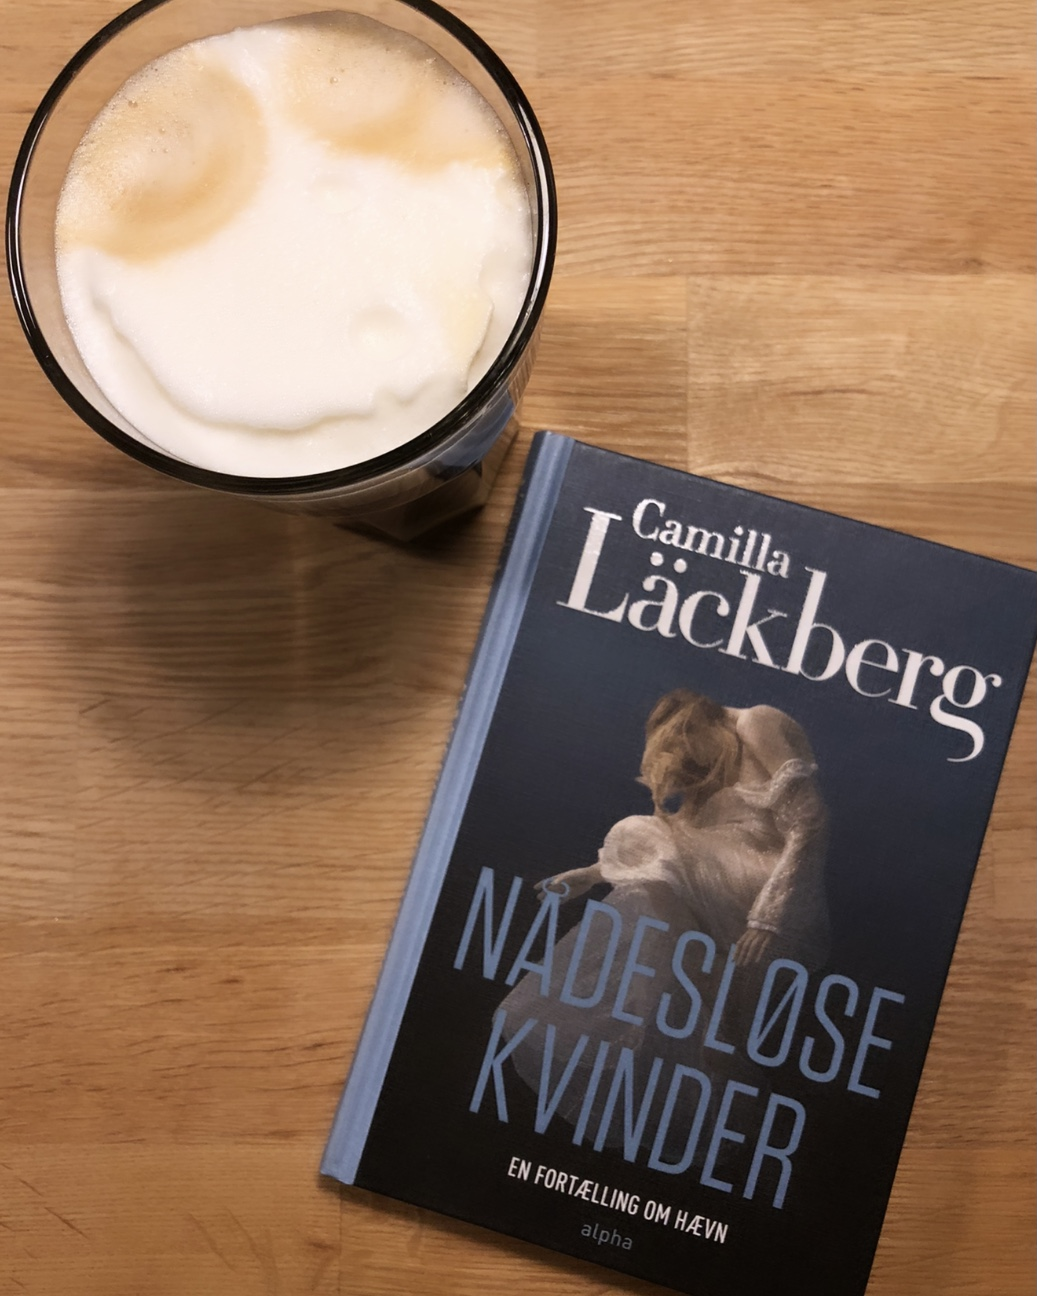 Nådesløse kvinder, Camilla Läckberg, Alpha, Alpha Forlag, kvinnor utan nåd, svensk, en bog om hævn, hævn, krummeskrummelurer, krummeskrummelurer.dk, boganmeldelse, anbefaling, anmeldereksemplar,